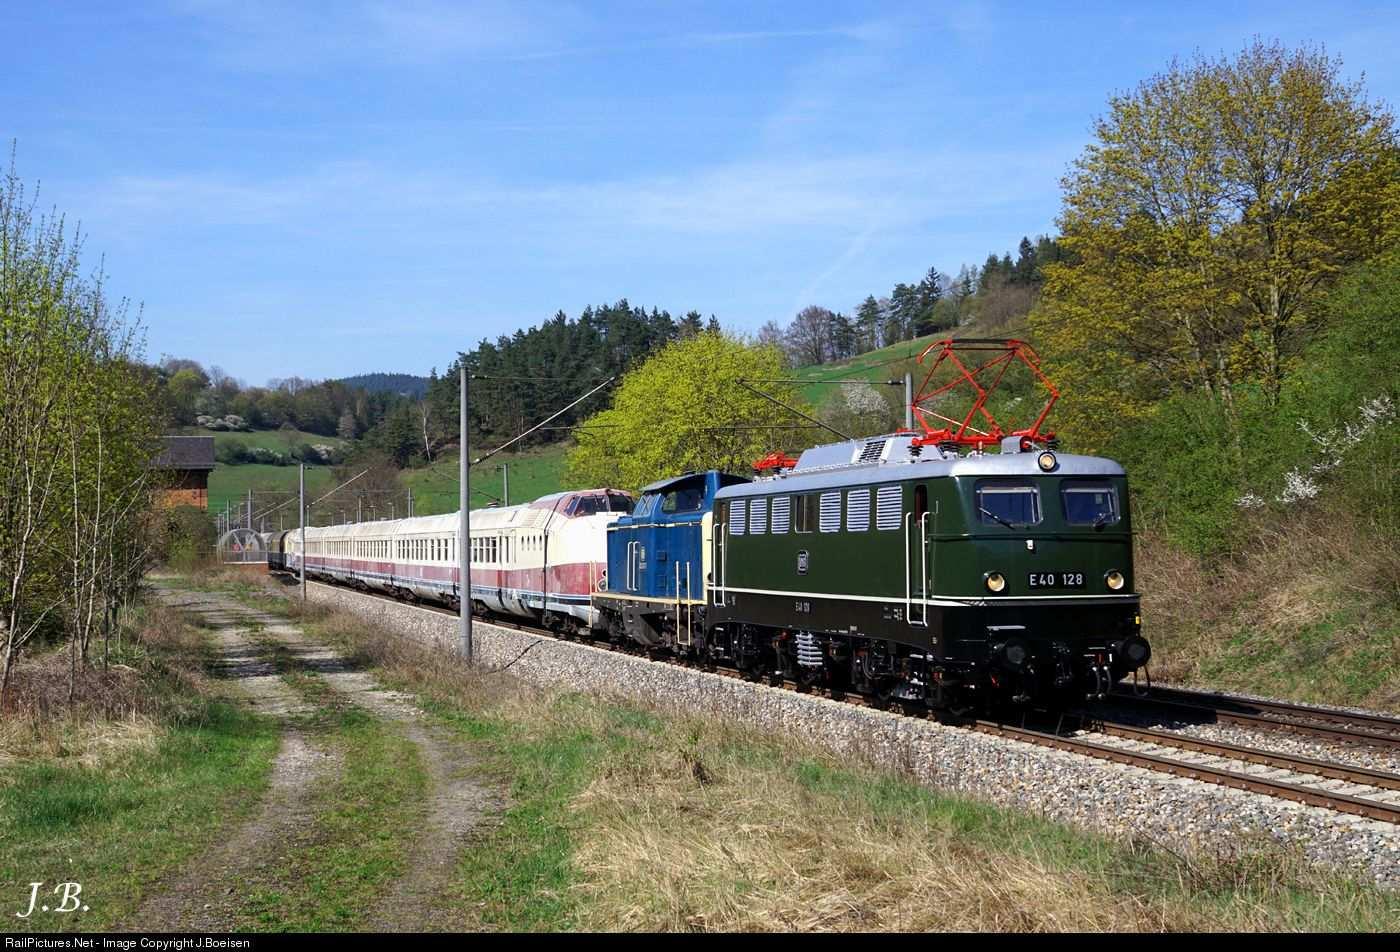 E40 128 212 372 Db Ag E40 At Markgolitz Germany By J Boeisen